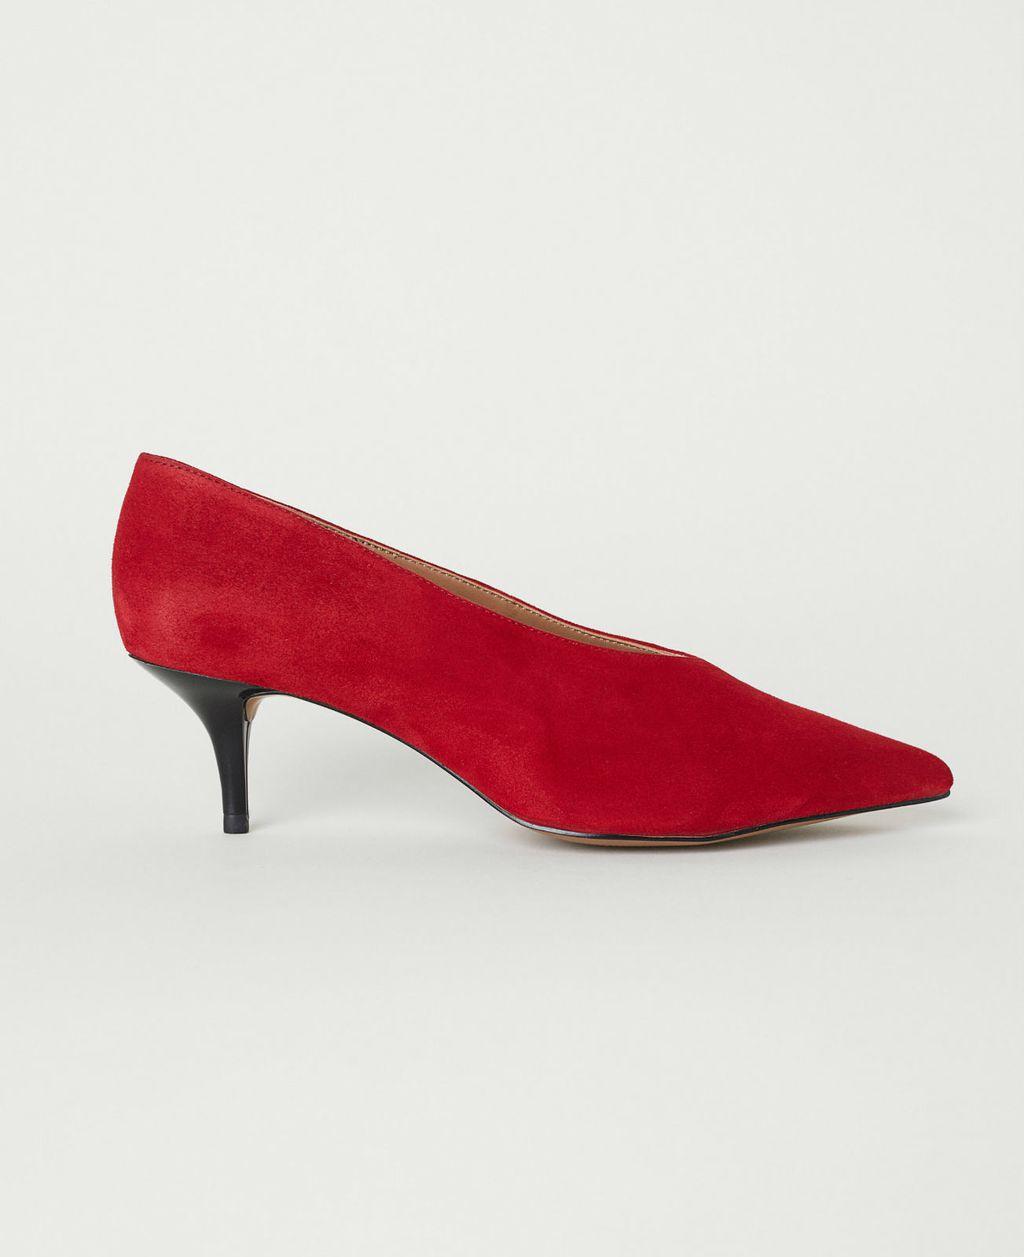 Cipele s potpetiicom od oko 5 centimetara - 3